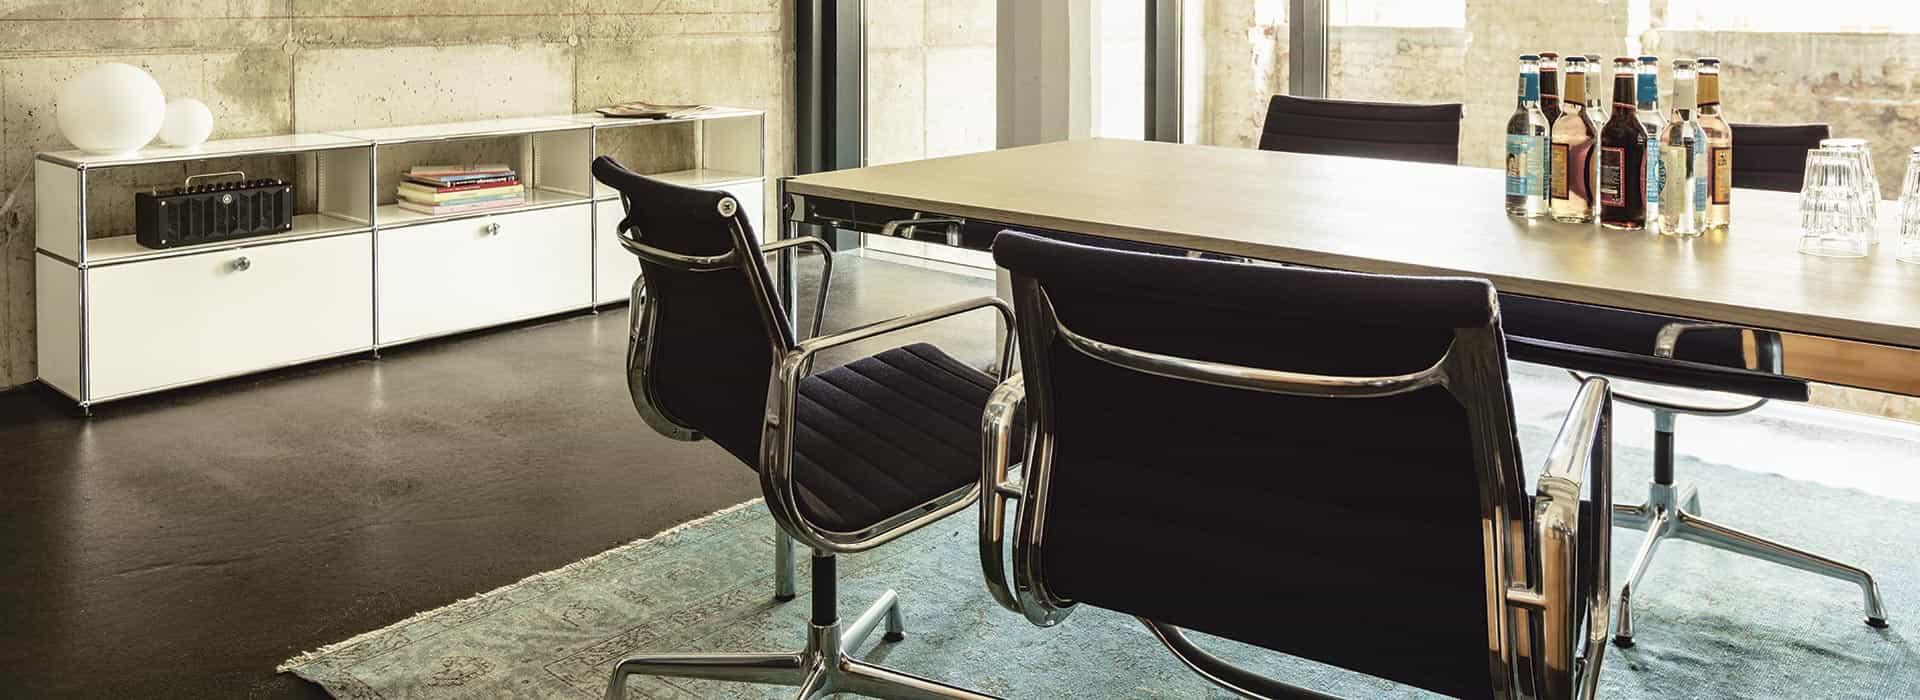 werkhaus Image